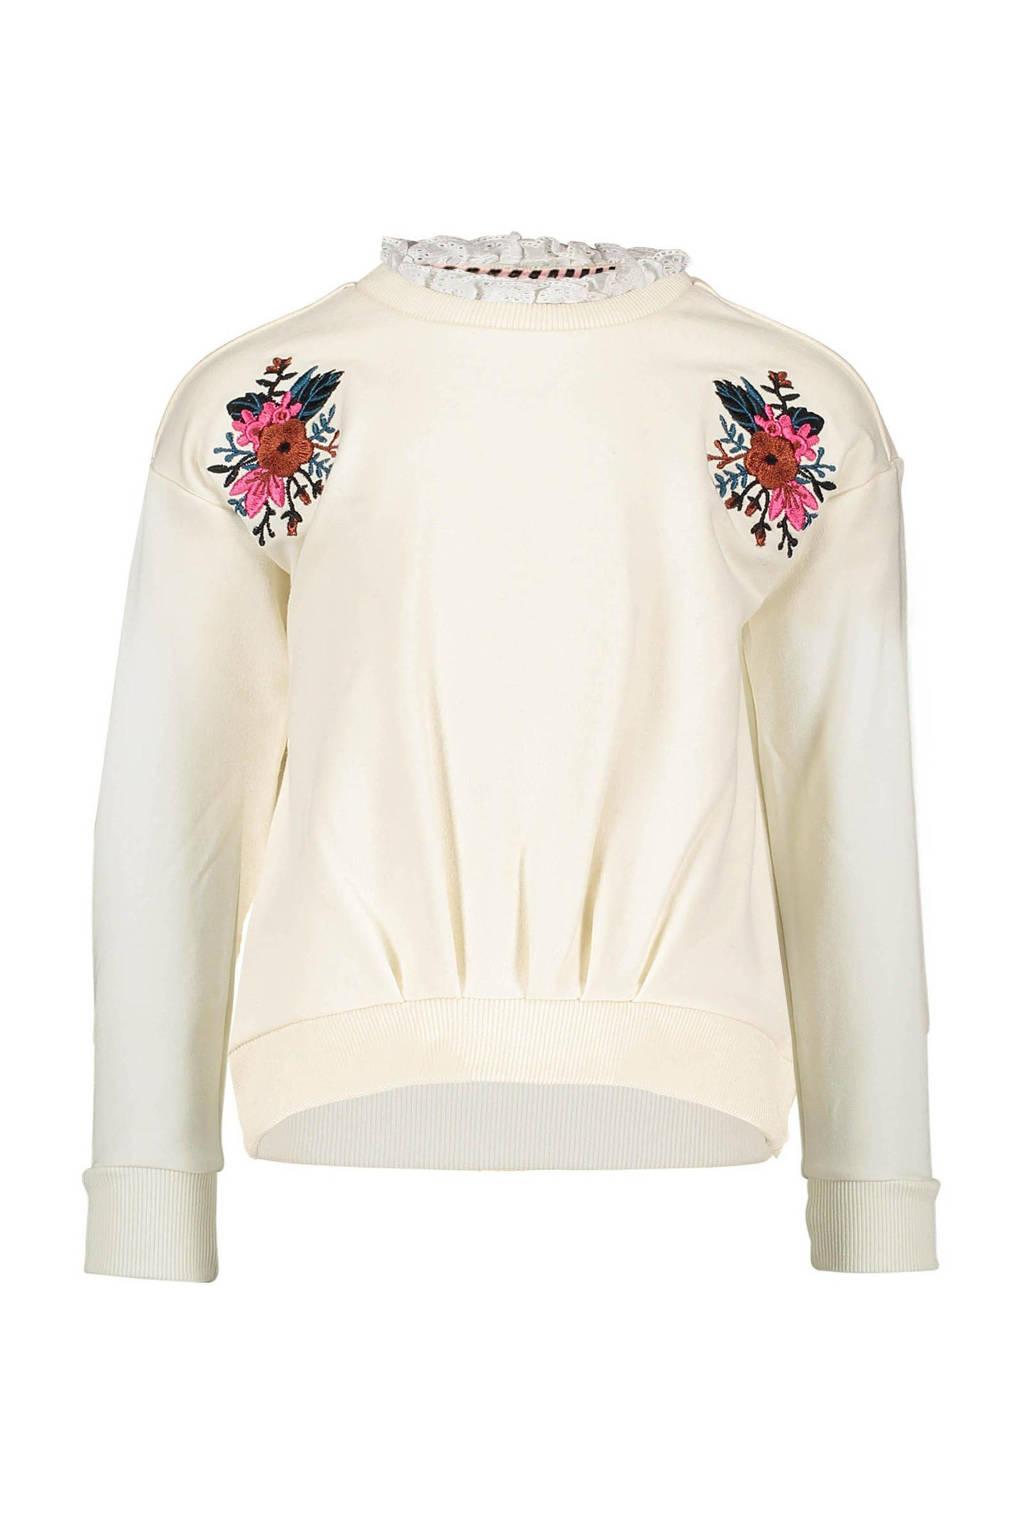 B.Nosy sweater met borduursels off white/roze/groen, Off white/roze/groen